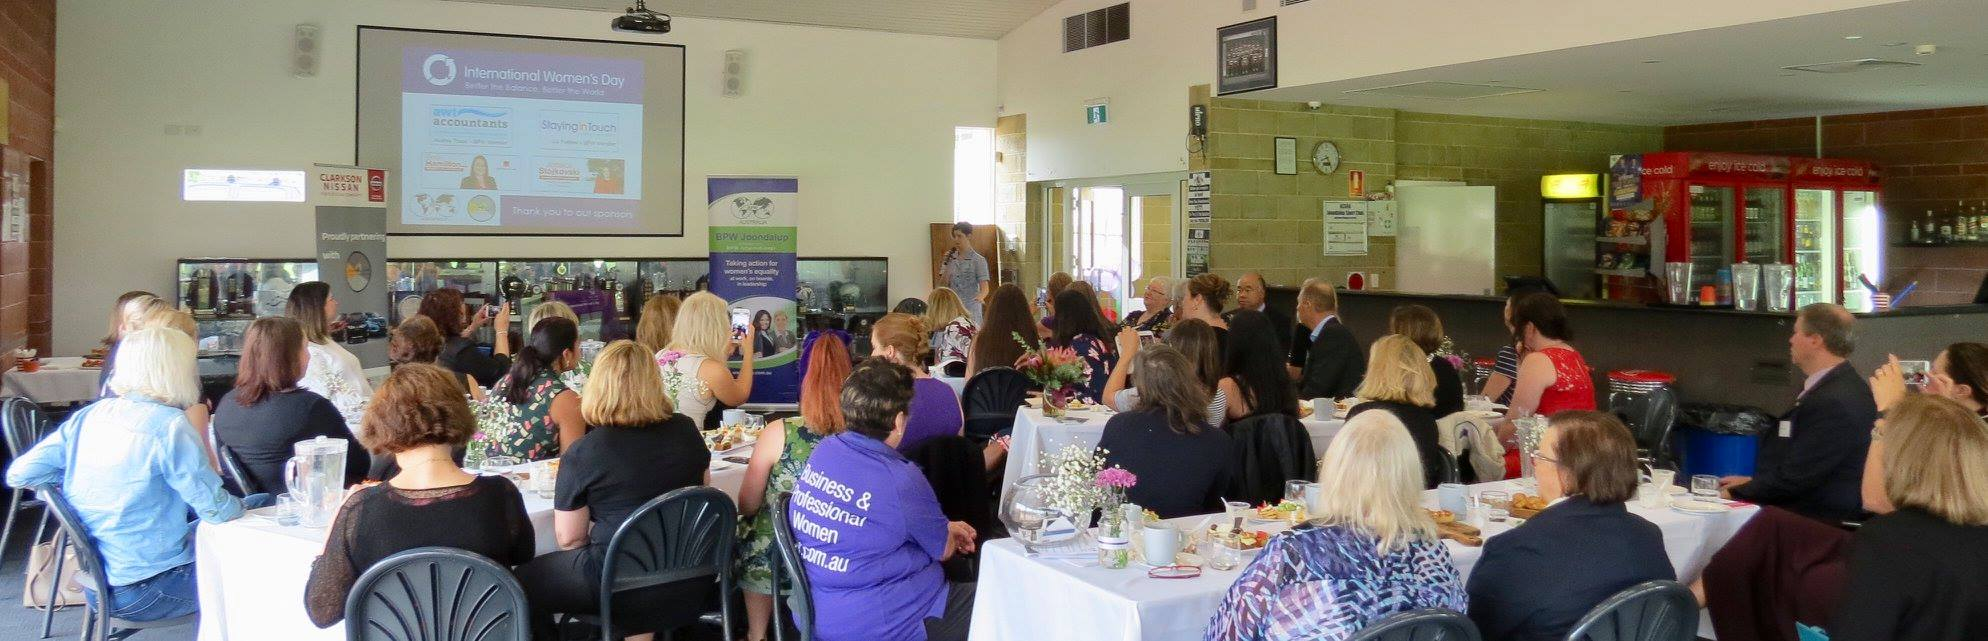 BPW Perth IWD event